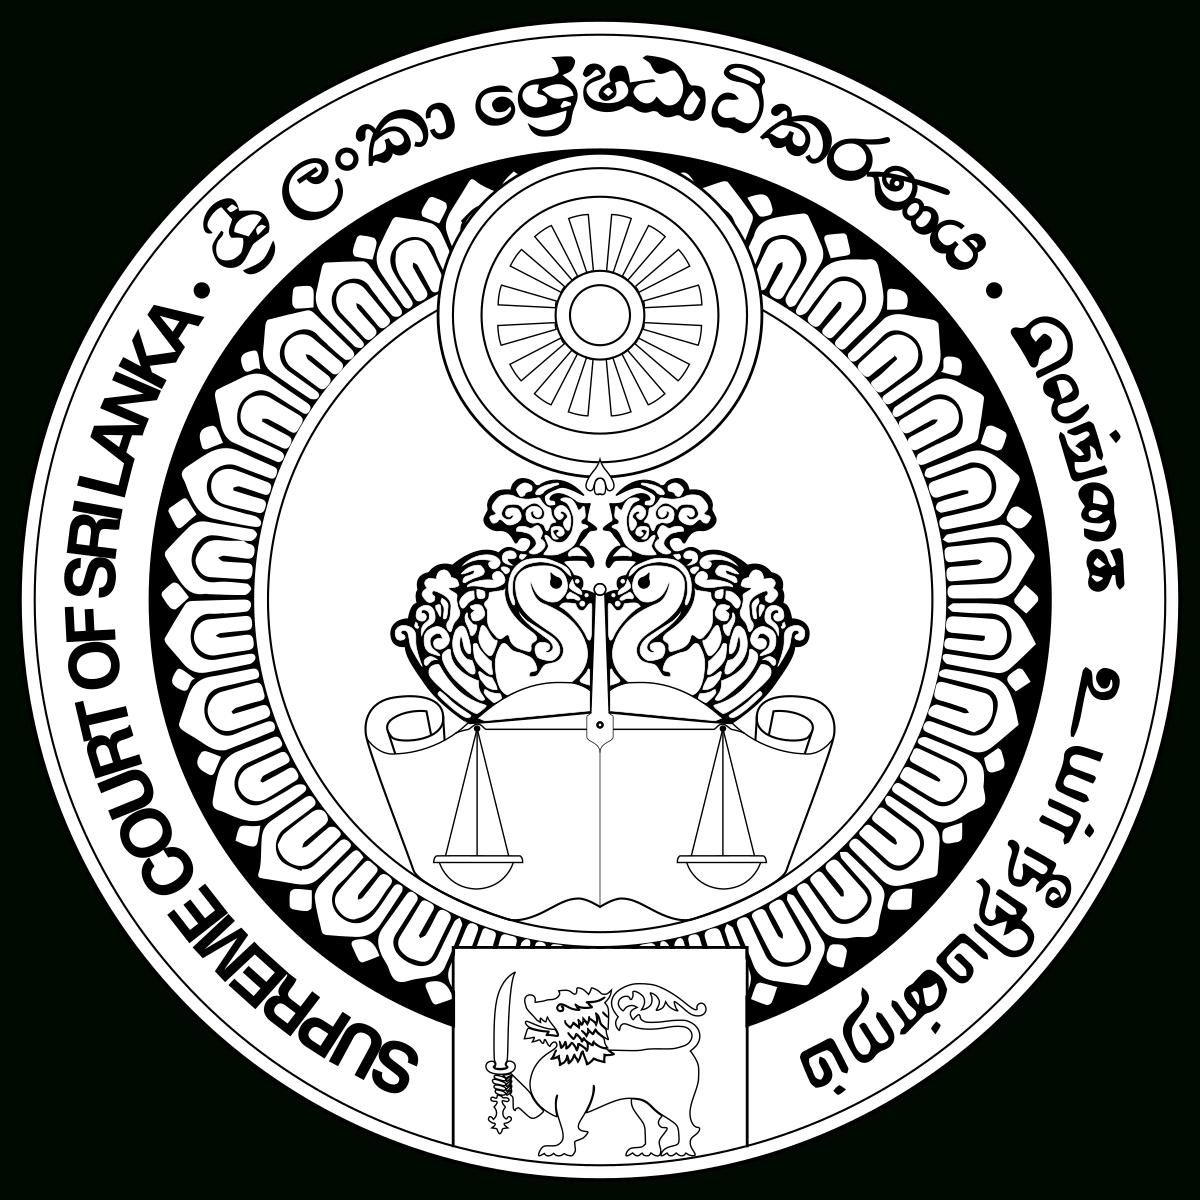 Supreme Court Of Sri Lanka - Wikipedia regarding 2012 Calendar Sri Lanka With All Holidays